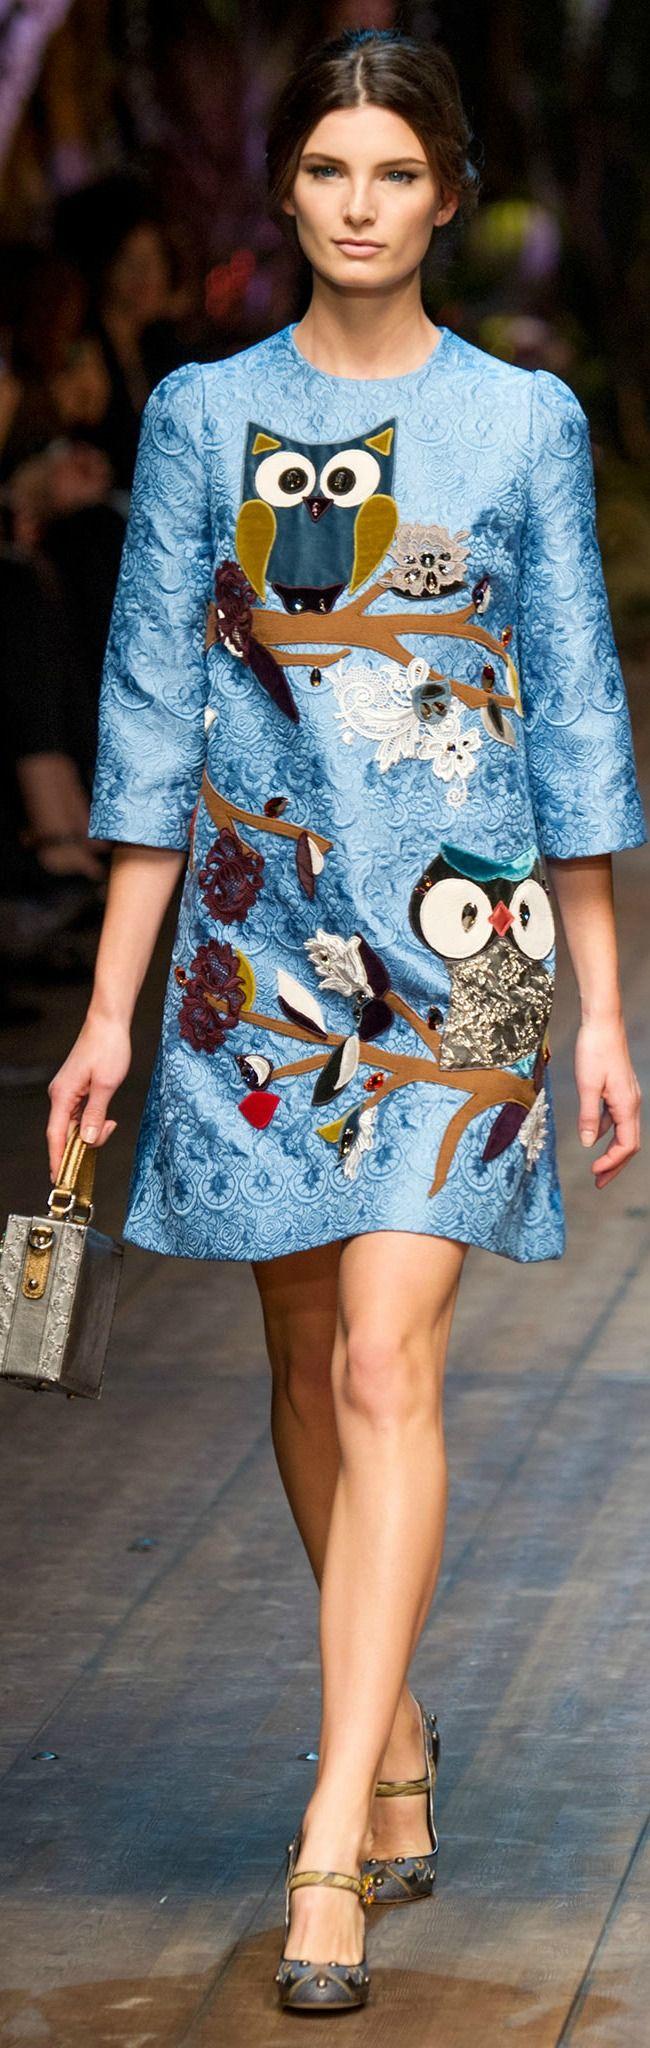 Dolce & Gabbana Fall 2014 / Winter 2015 RTW, Milan Fashion Week, Italy